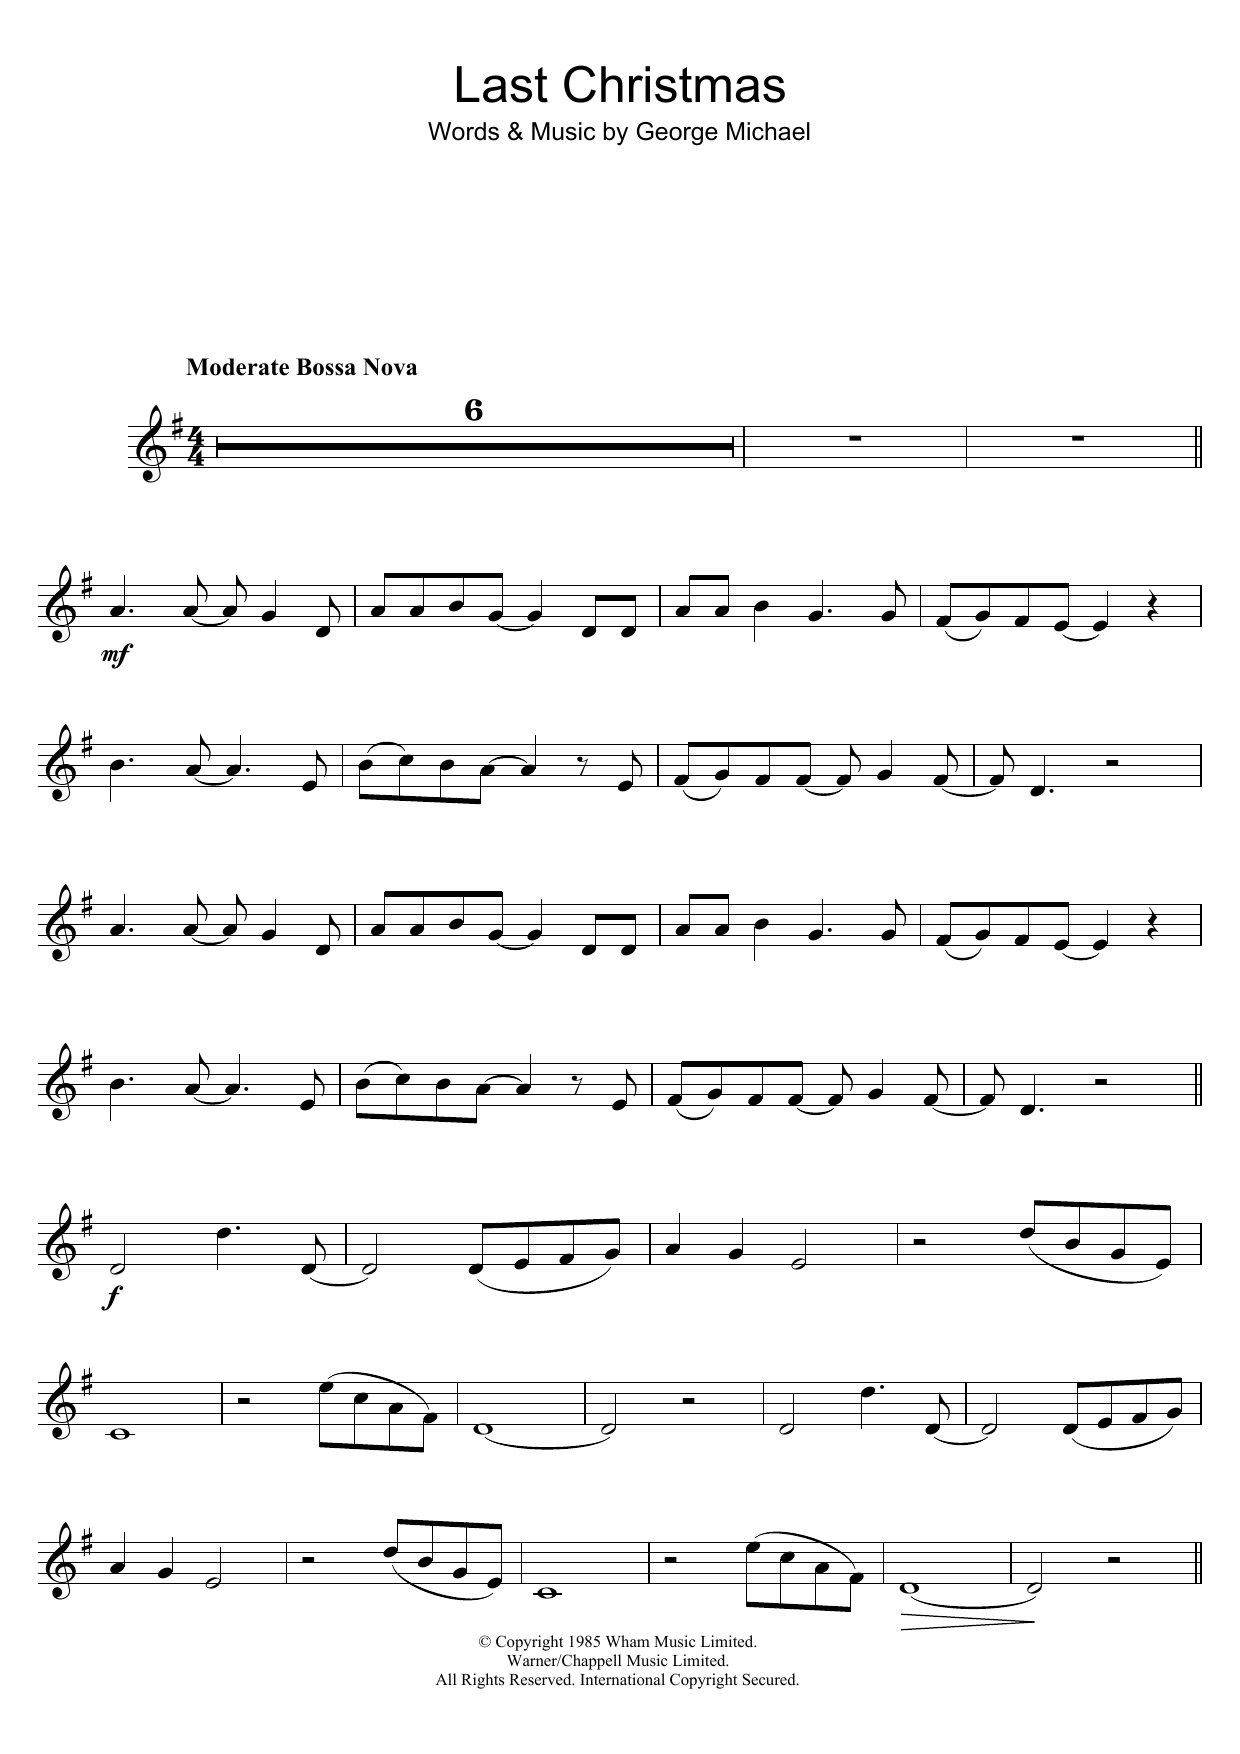 Sheet Music Digital Files To Print - Licensed Wham! Digital Sheet Music